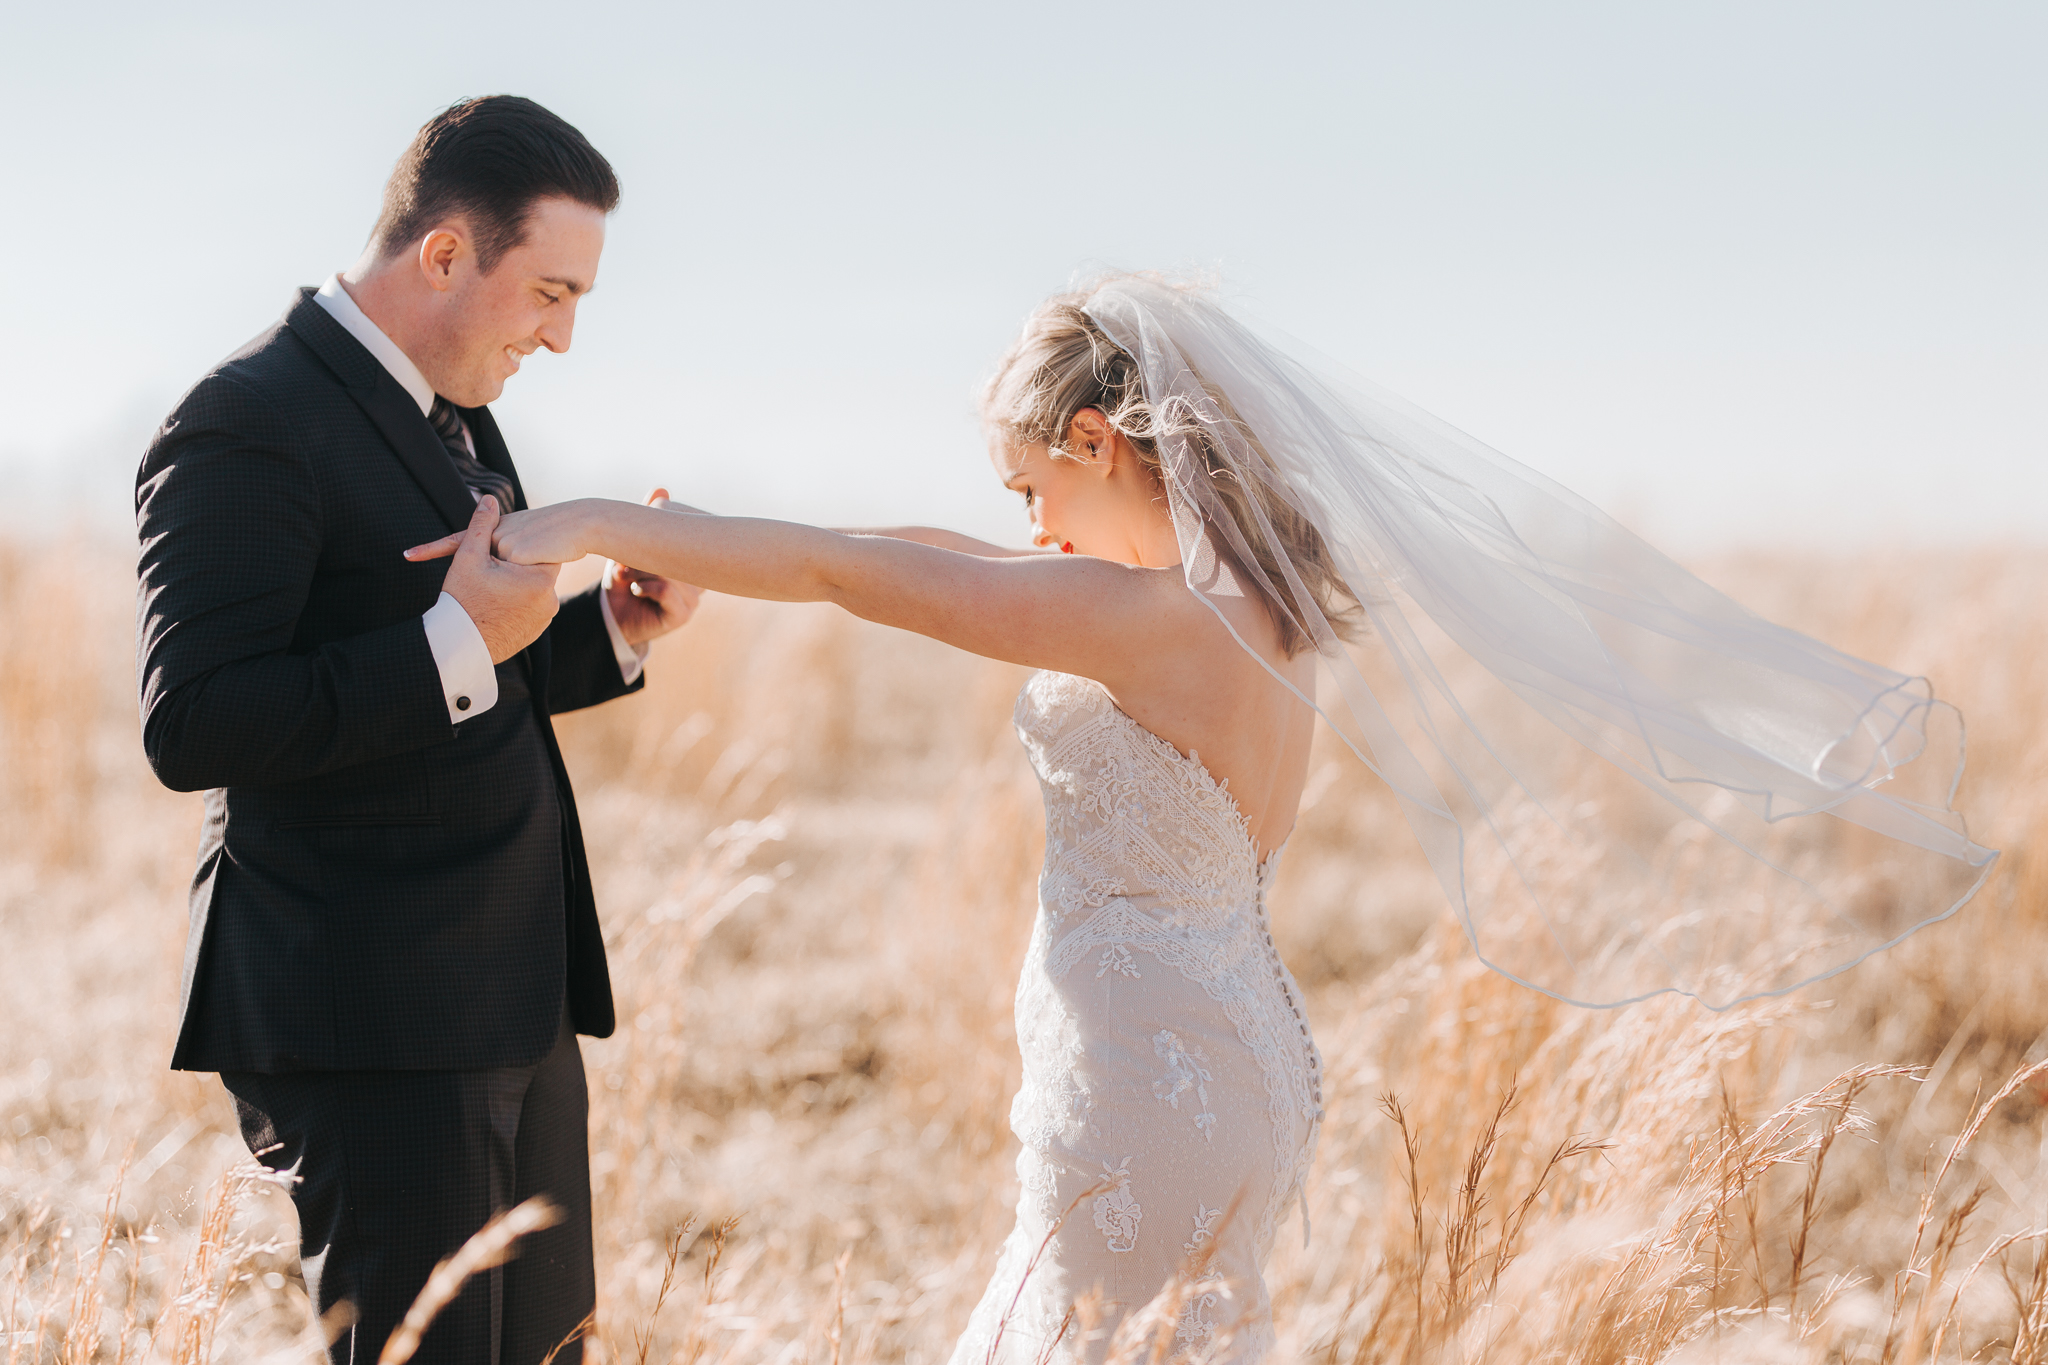 0061 Ariana Jordan Photo - Cameron & Lauren's Wedding at Talon Winery  3832.jpg